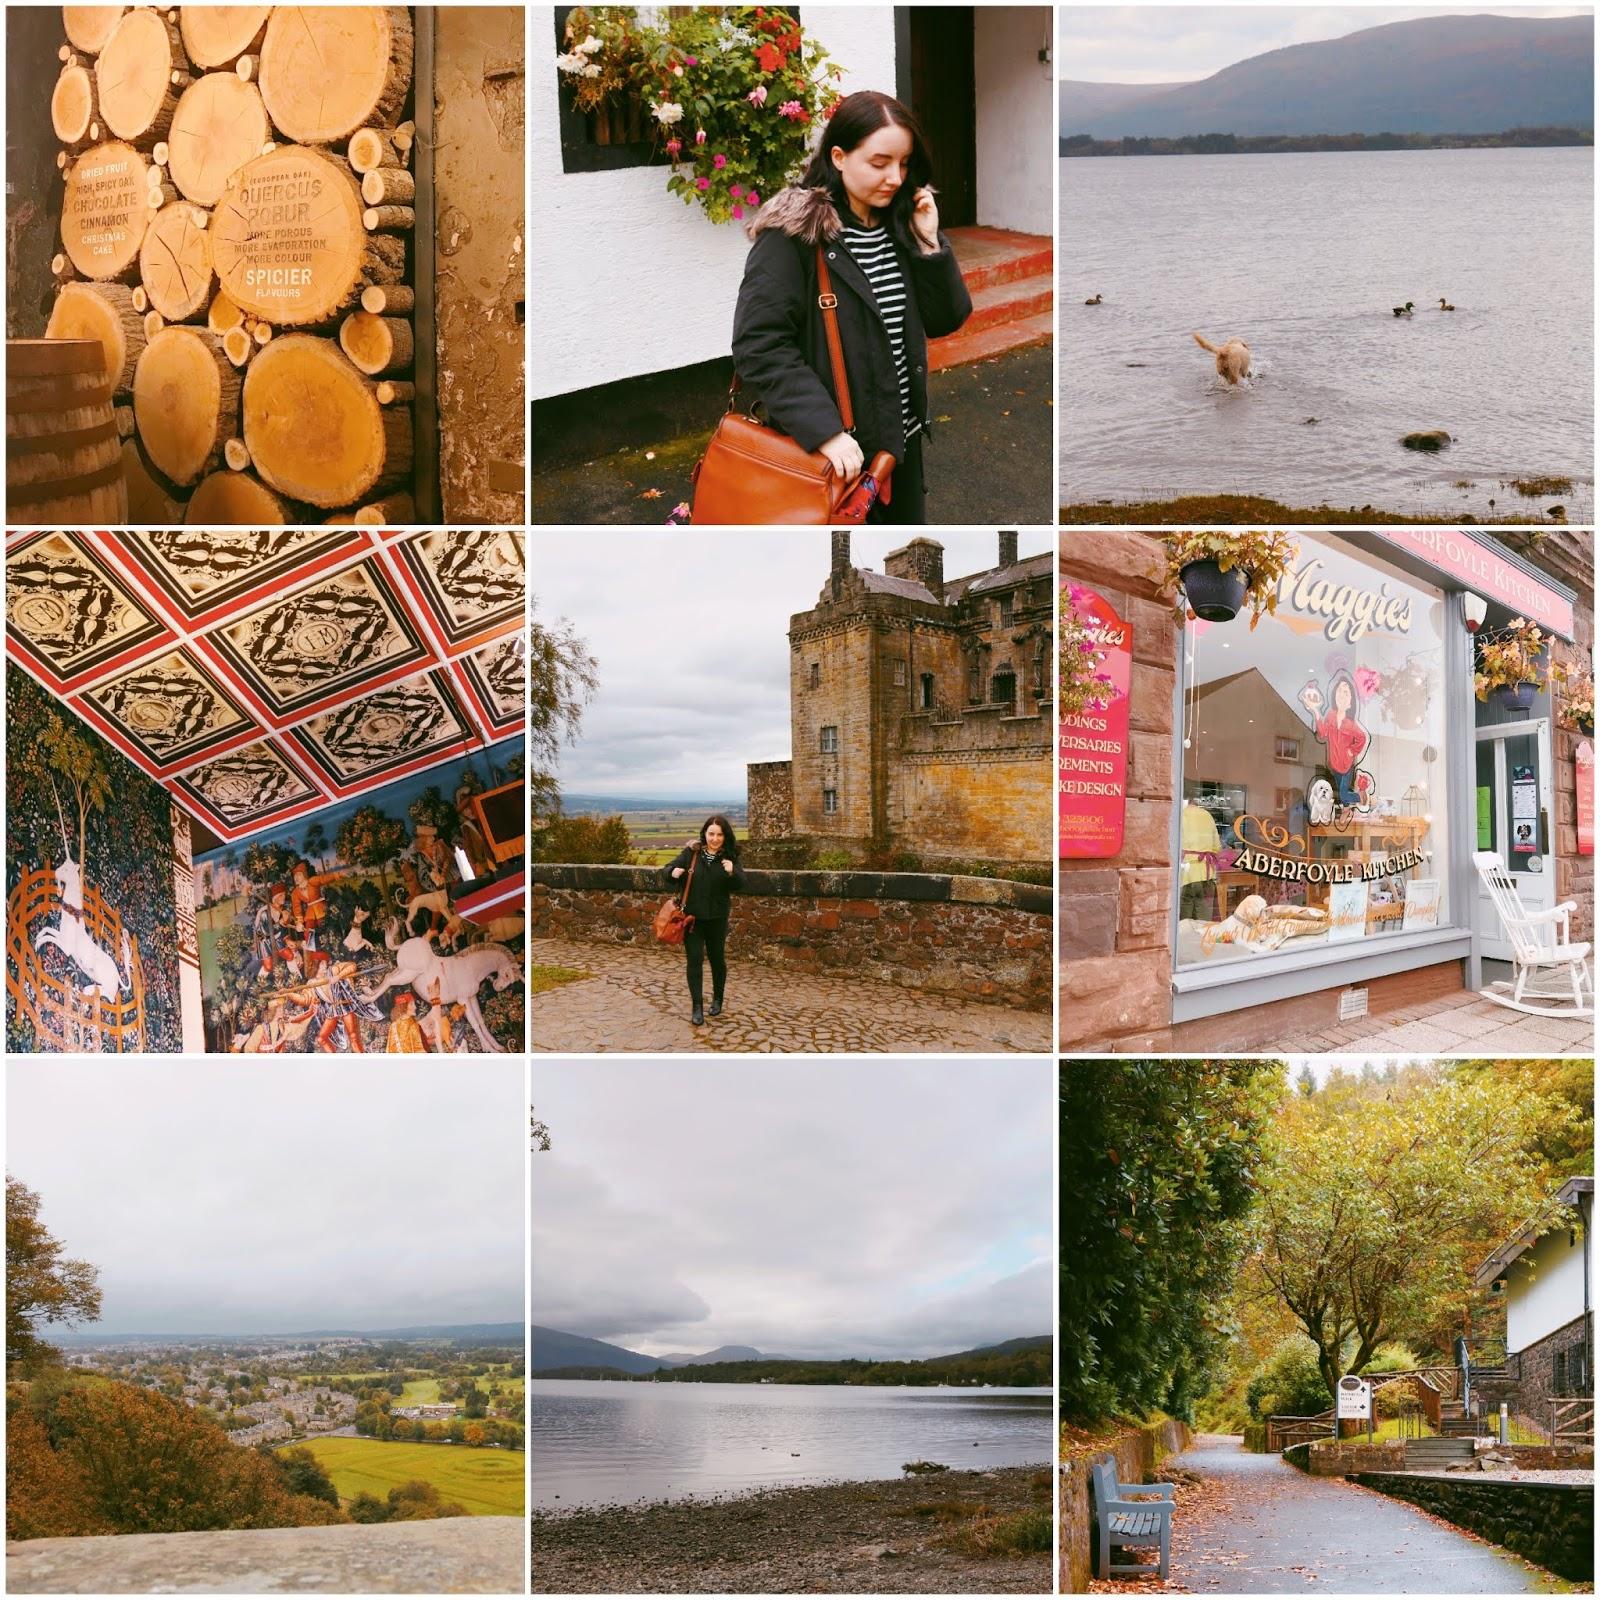 Glasgow Photo Diary: Stirling Castle, Loch Lomond + Glengoyne Distillery